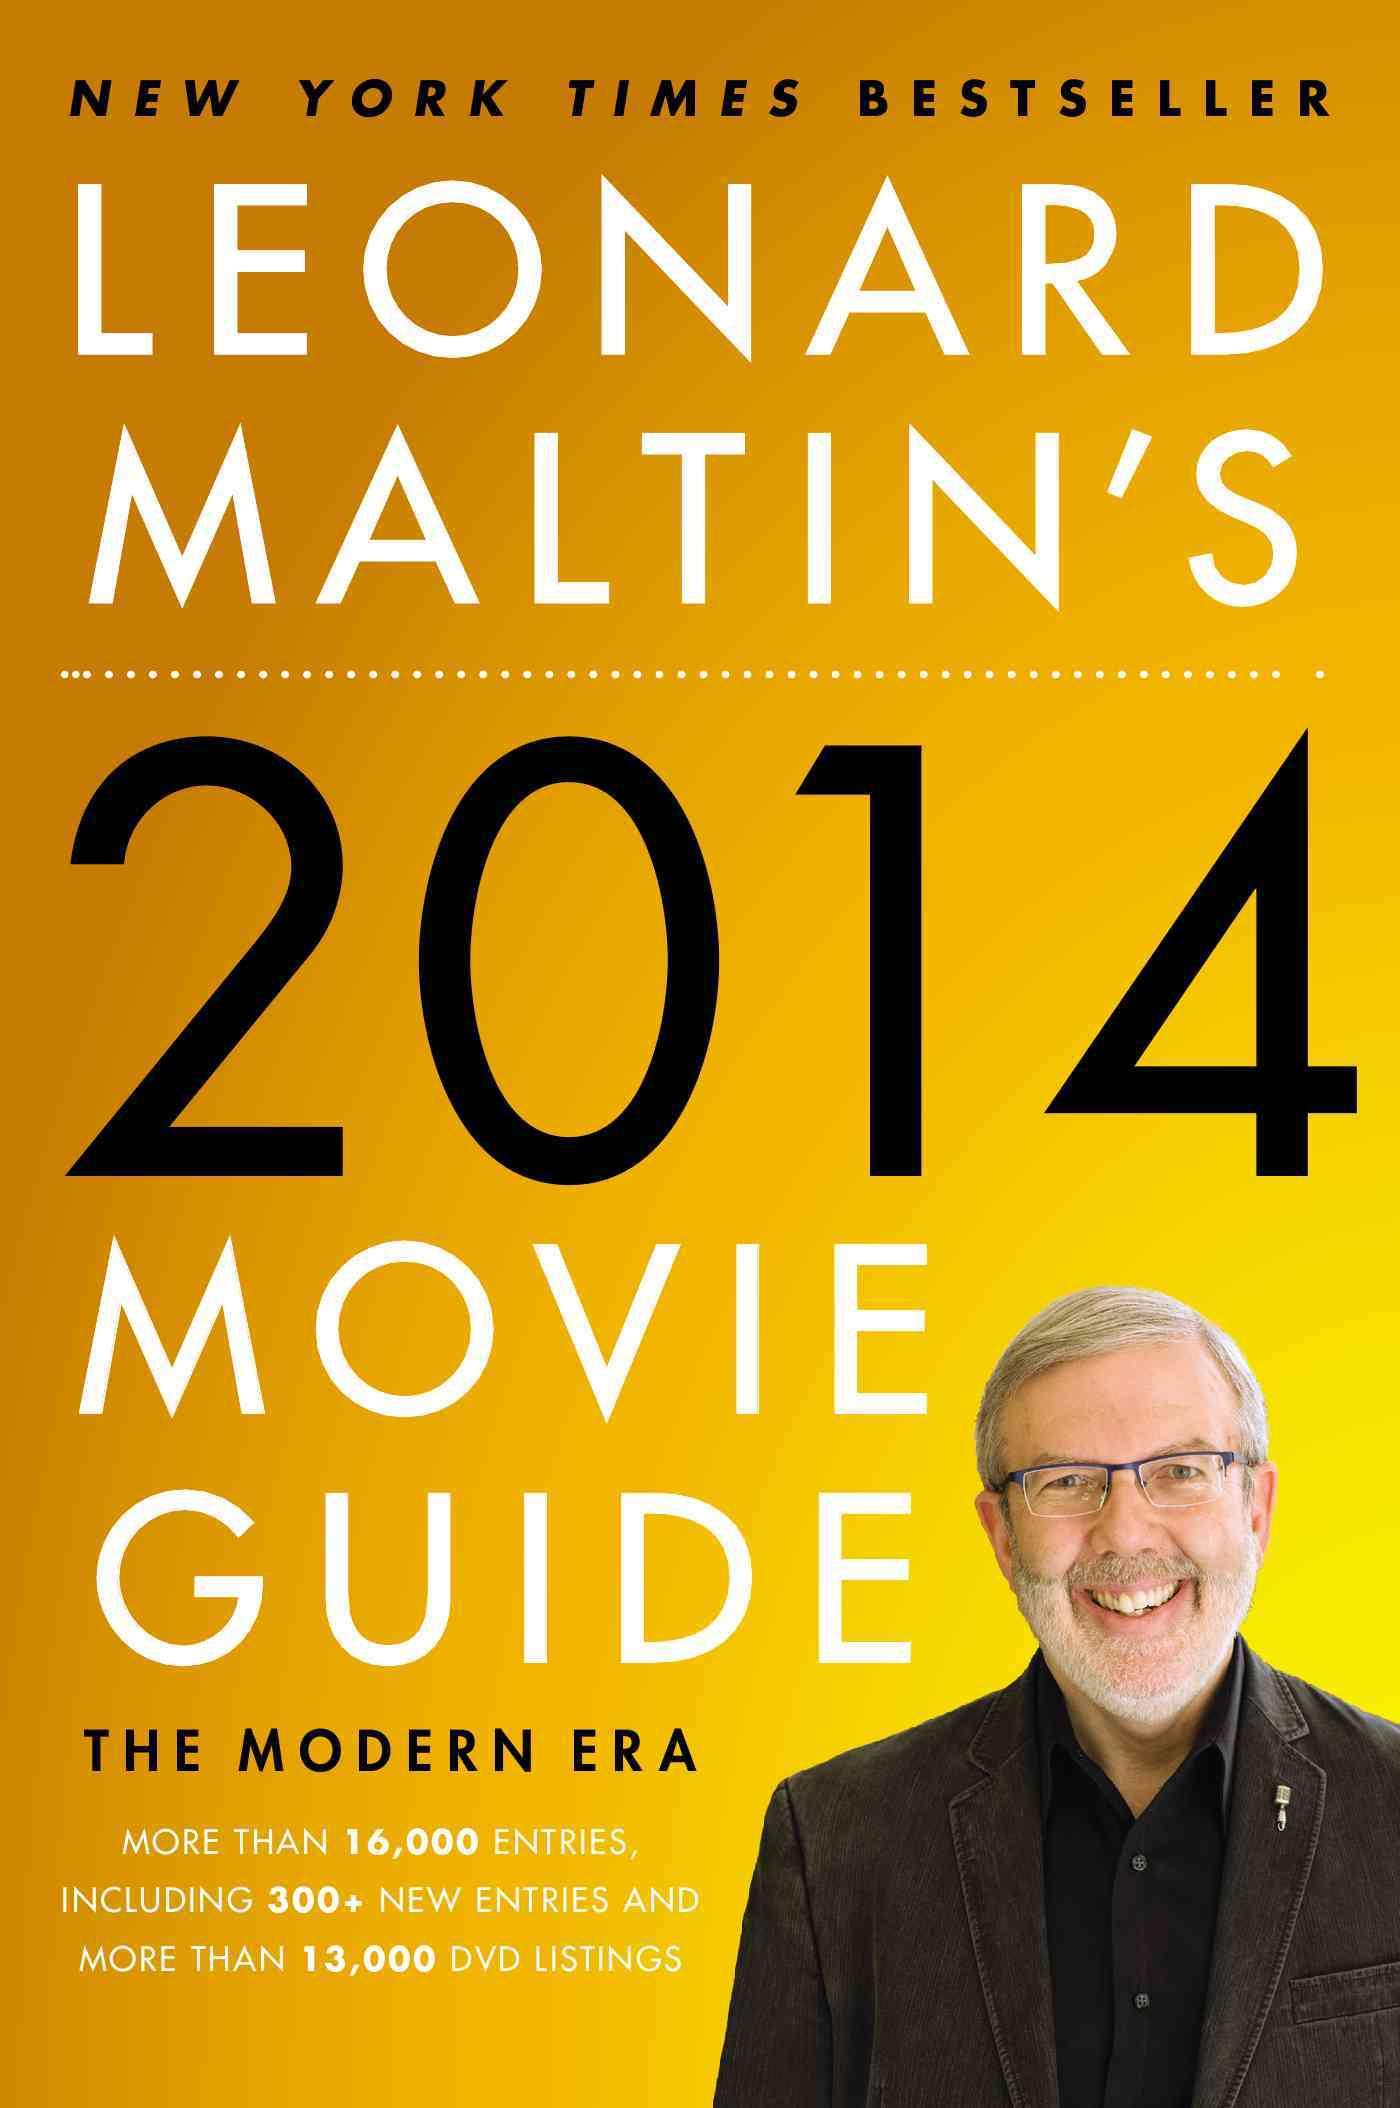 Leonard Maltin's Movie Guide 2014: The Modern Era (Paperback)